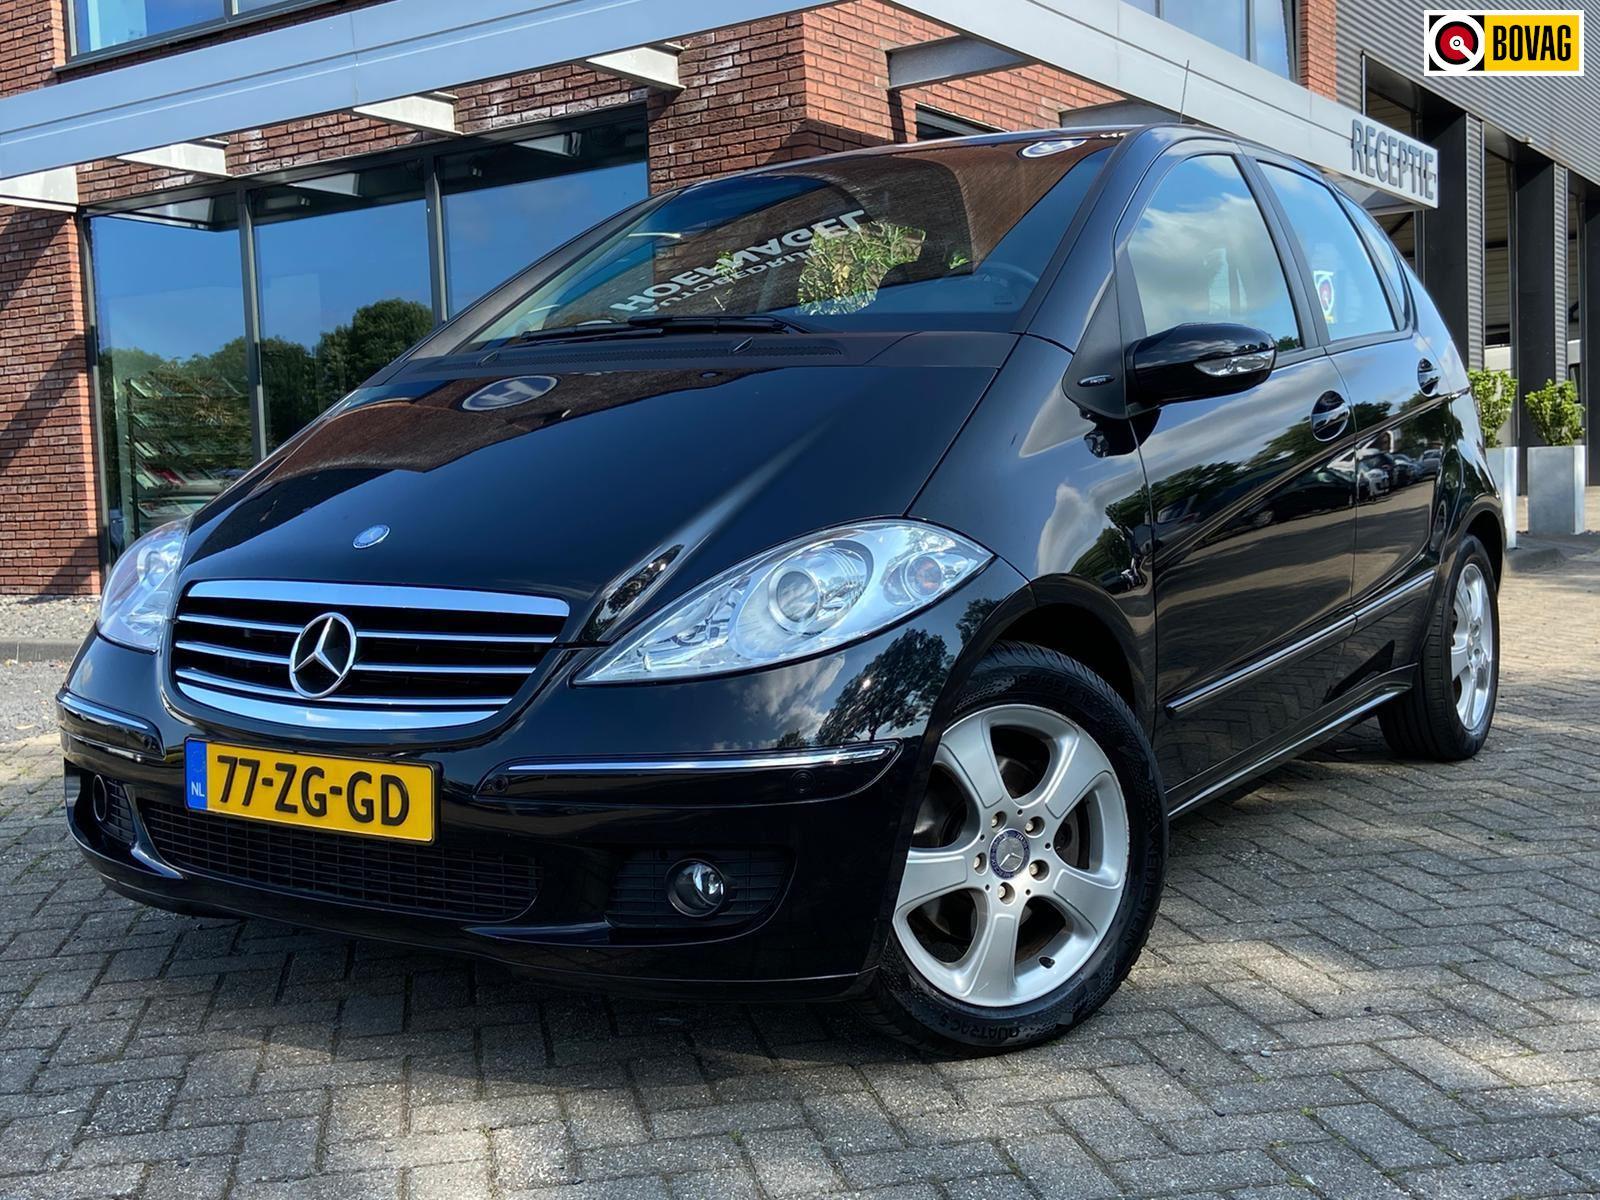 Mercedes-Benz A-klasse occasion - Autobedrijf H. Hoefnagel